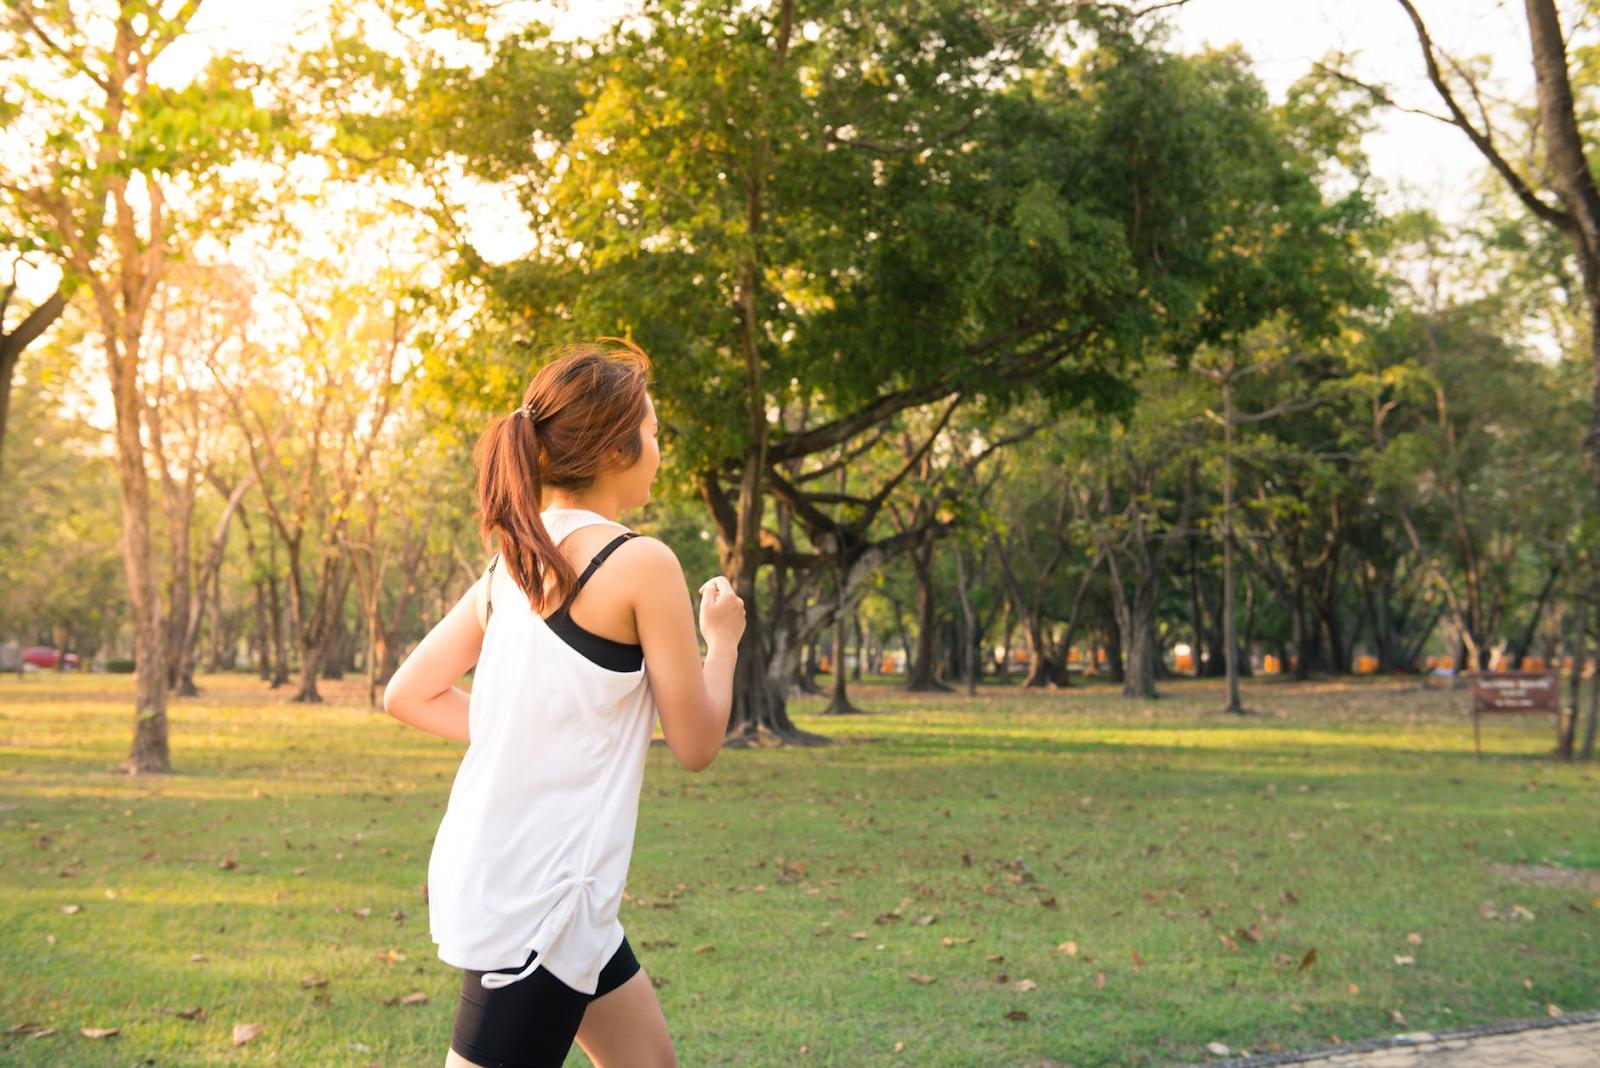 Talent retention: Woman runs in the park